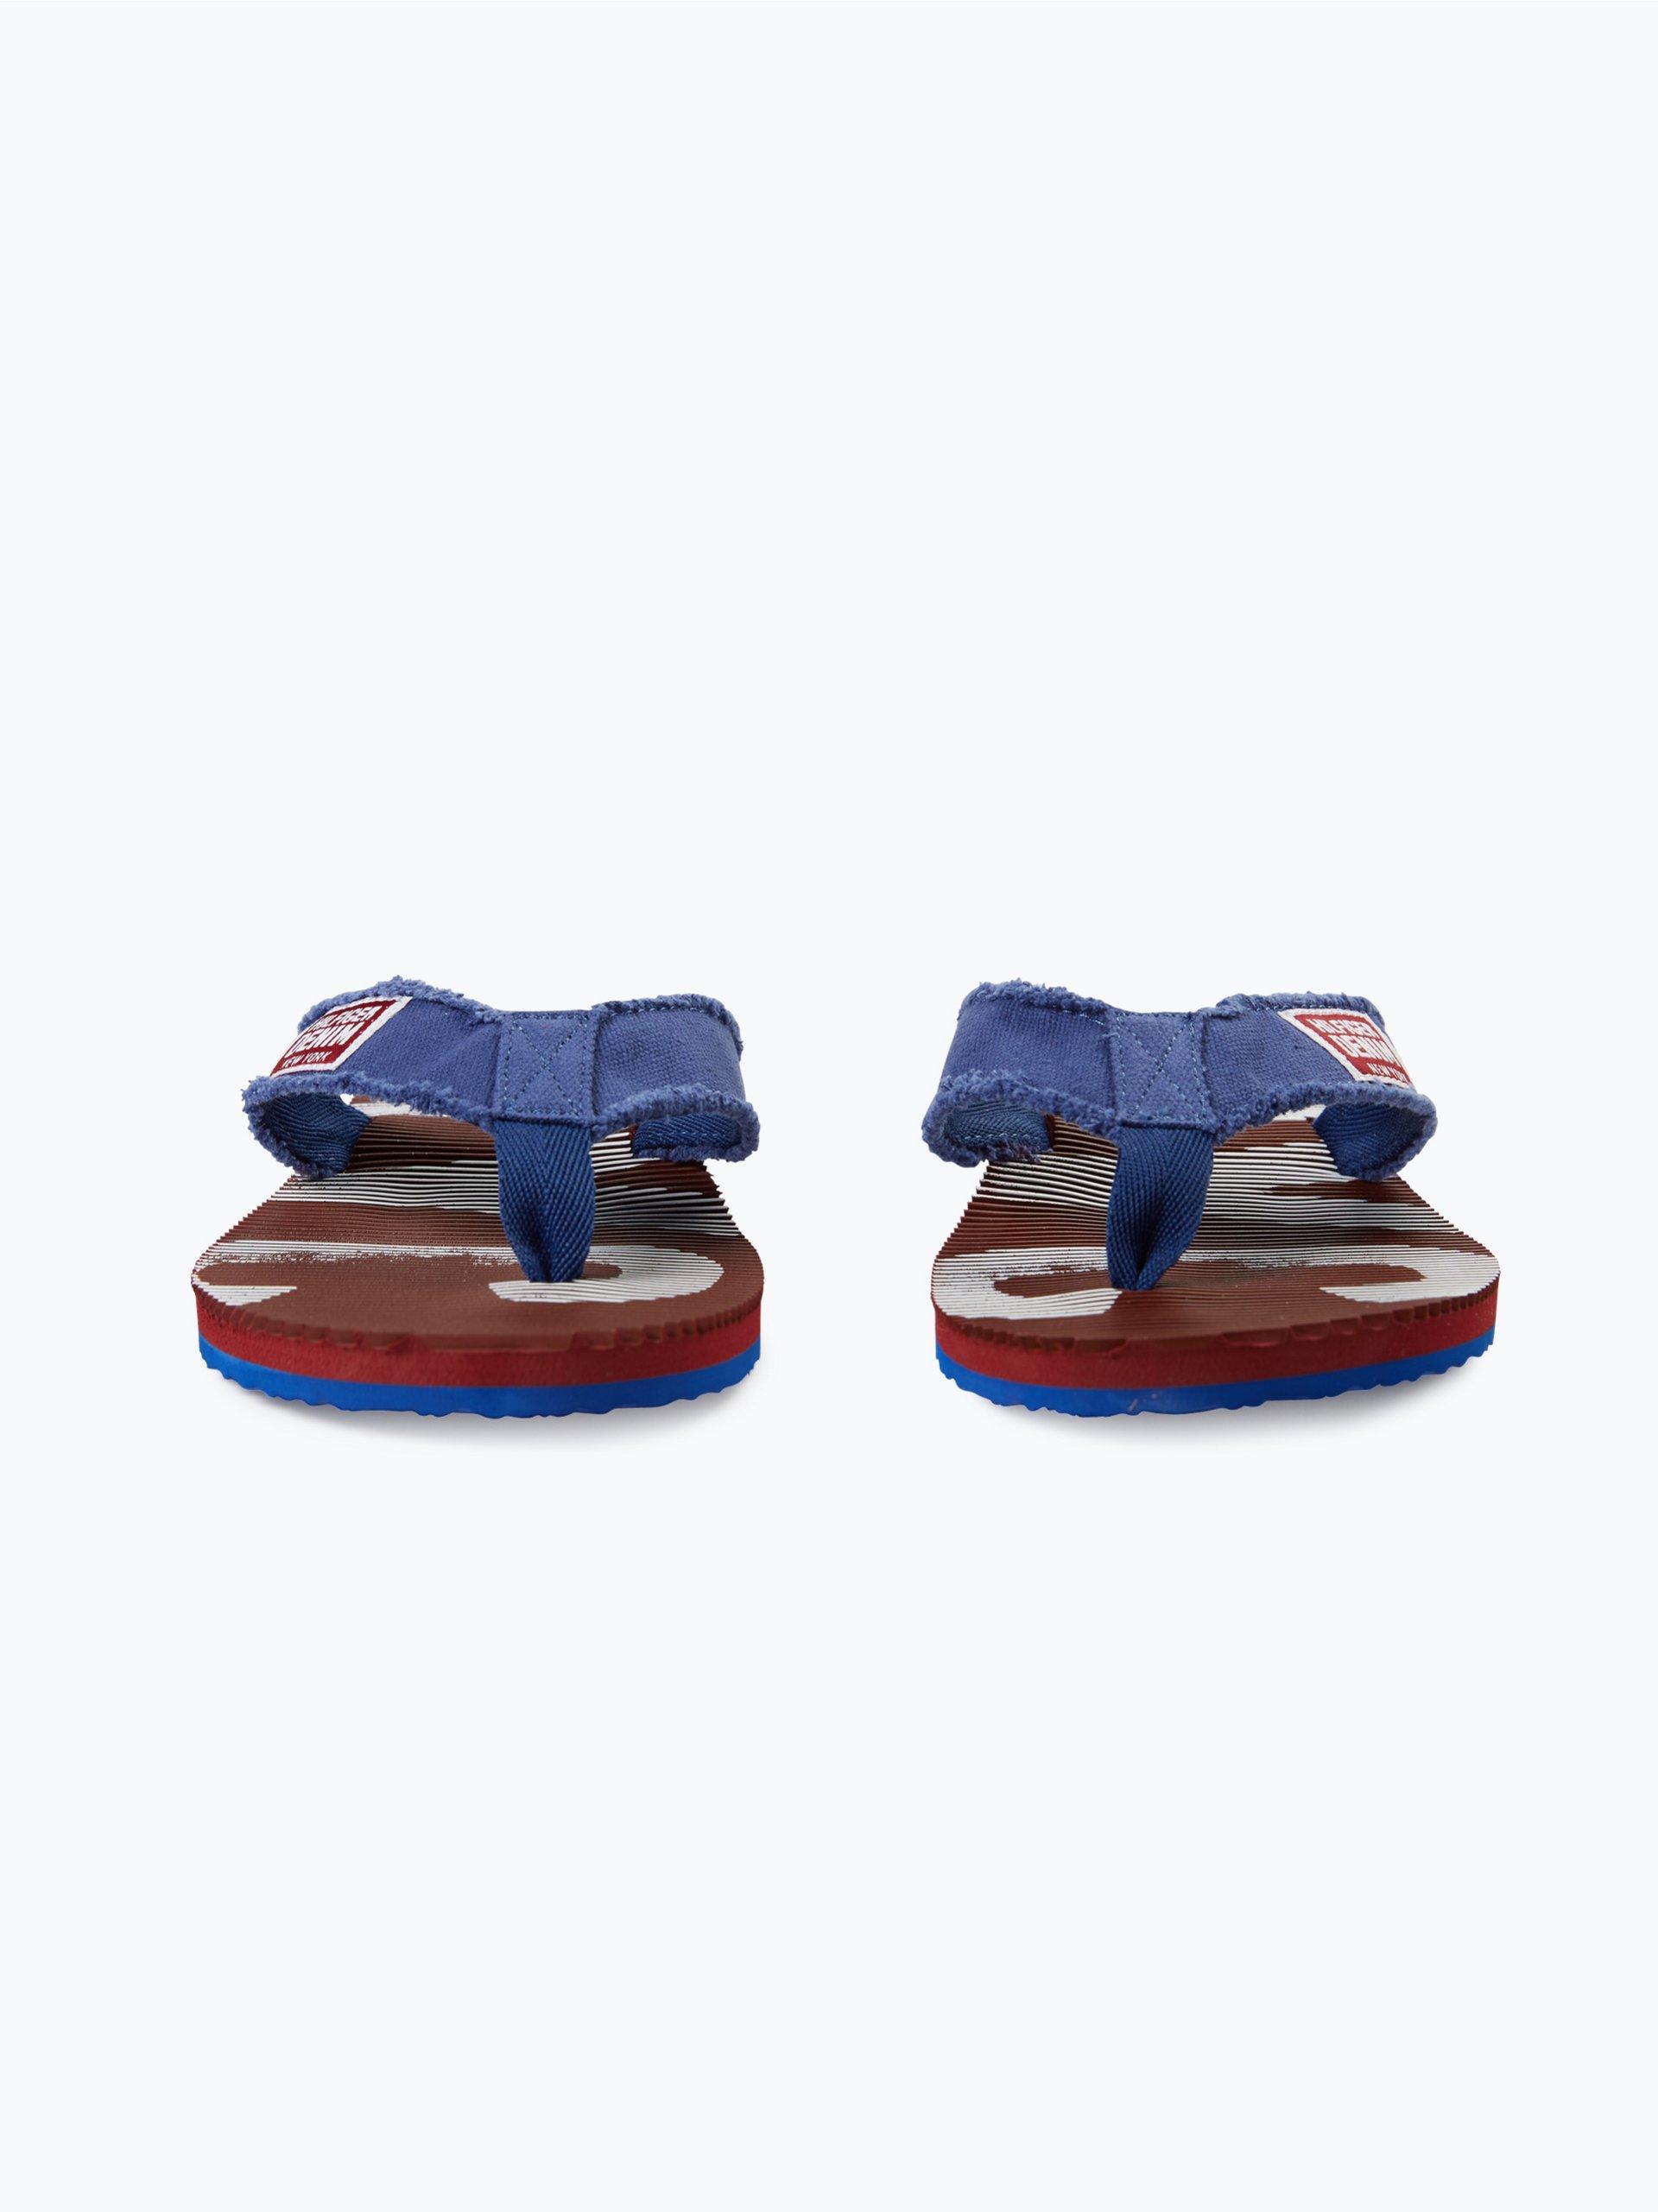 tommy jeans herren sandalen beach 6d blau uni online. Black Bedroom Furniture Sets. Home Design Ideas